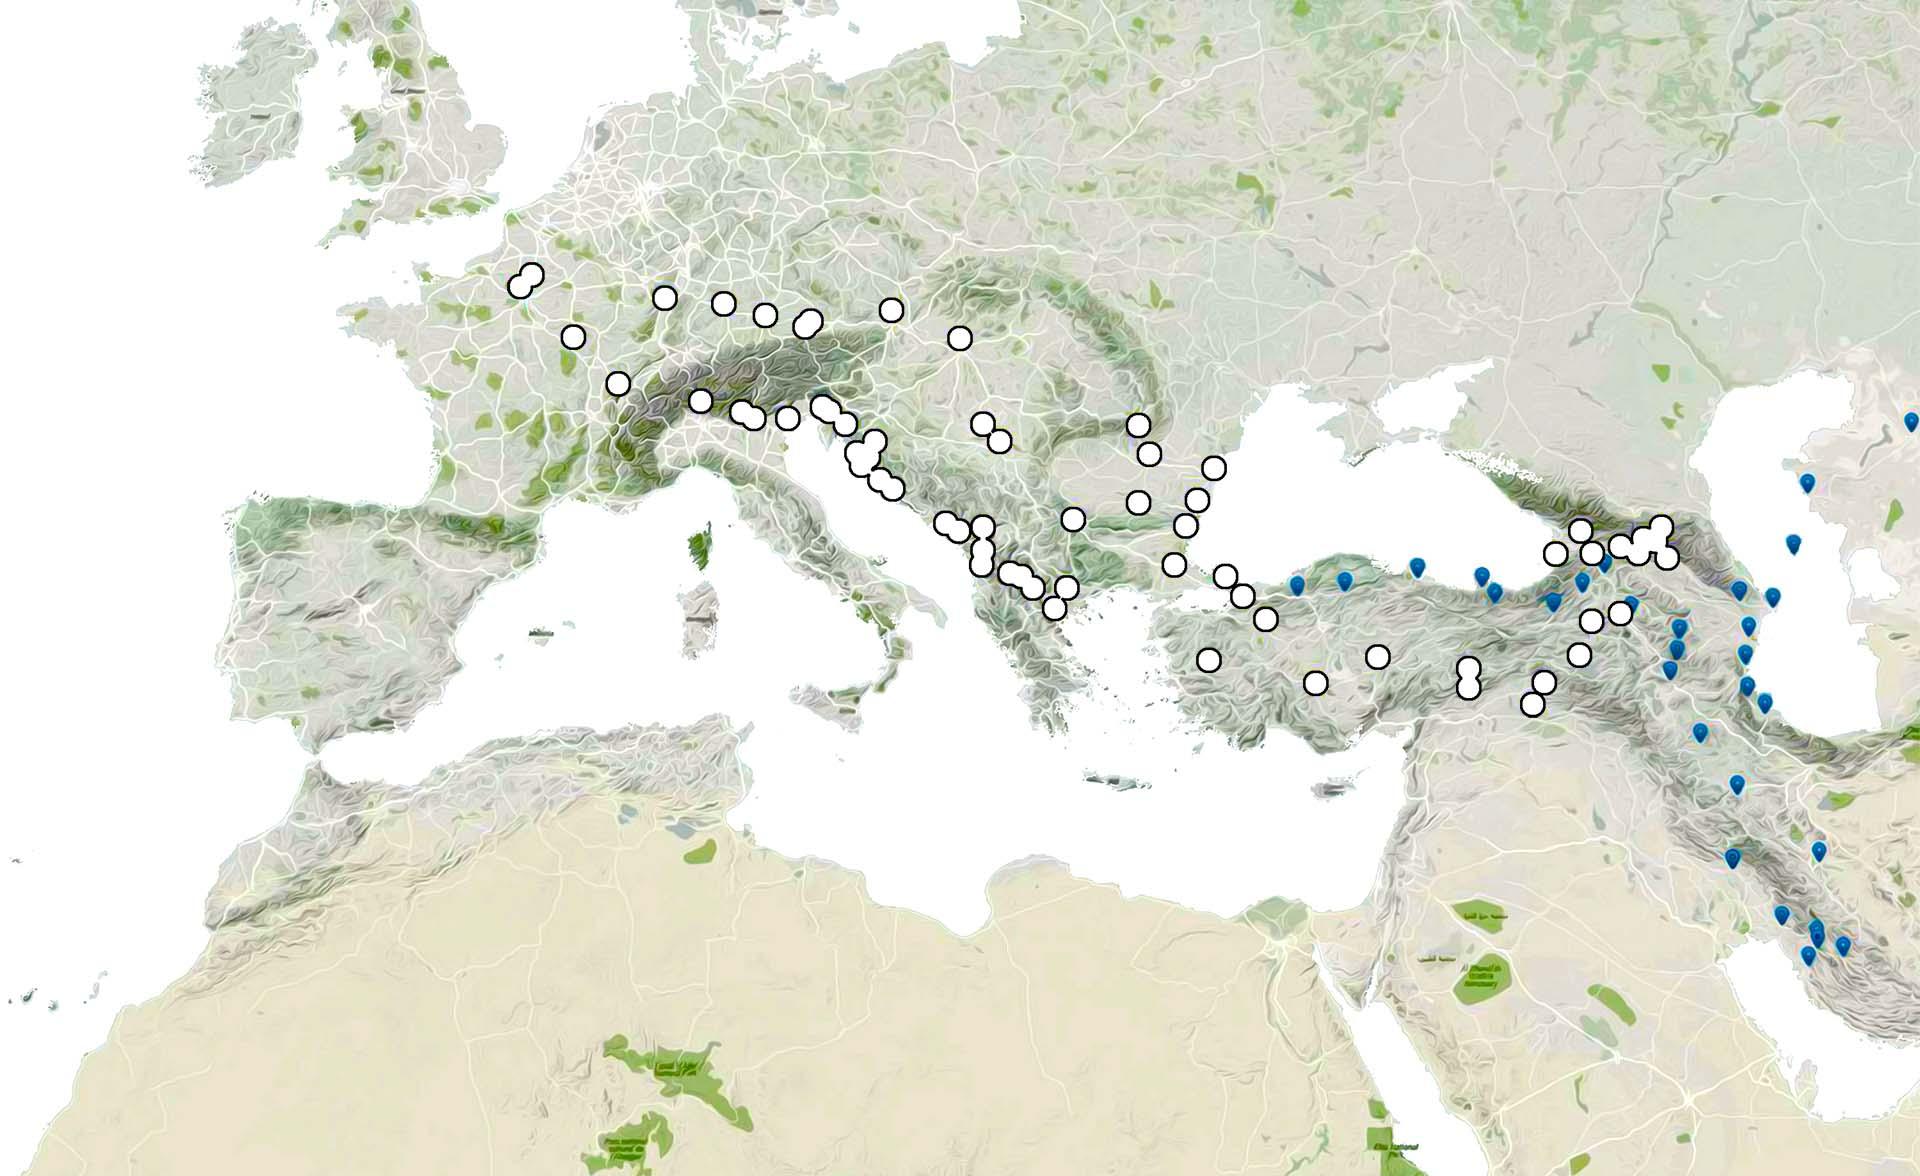 mapvoyageeurope.jpg